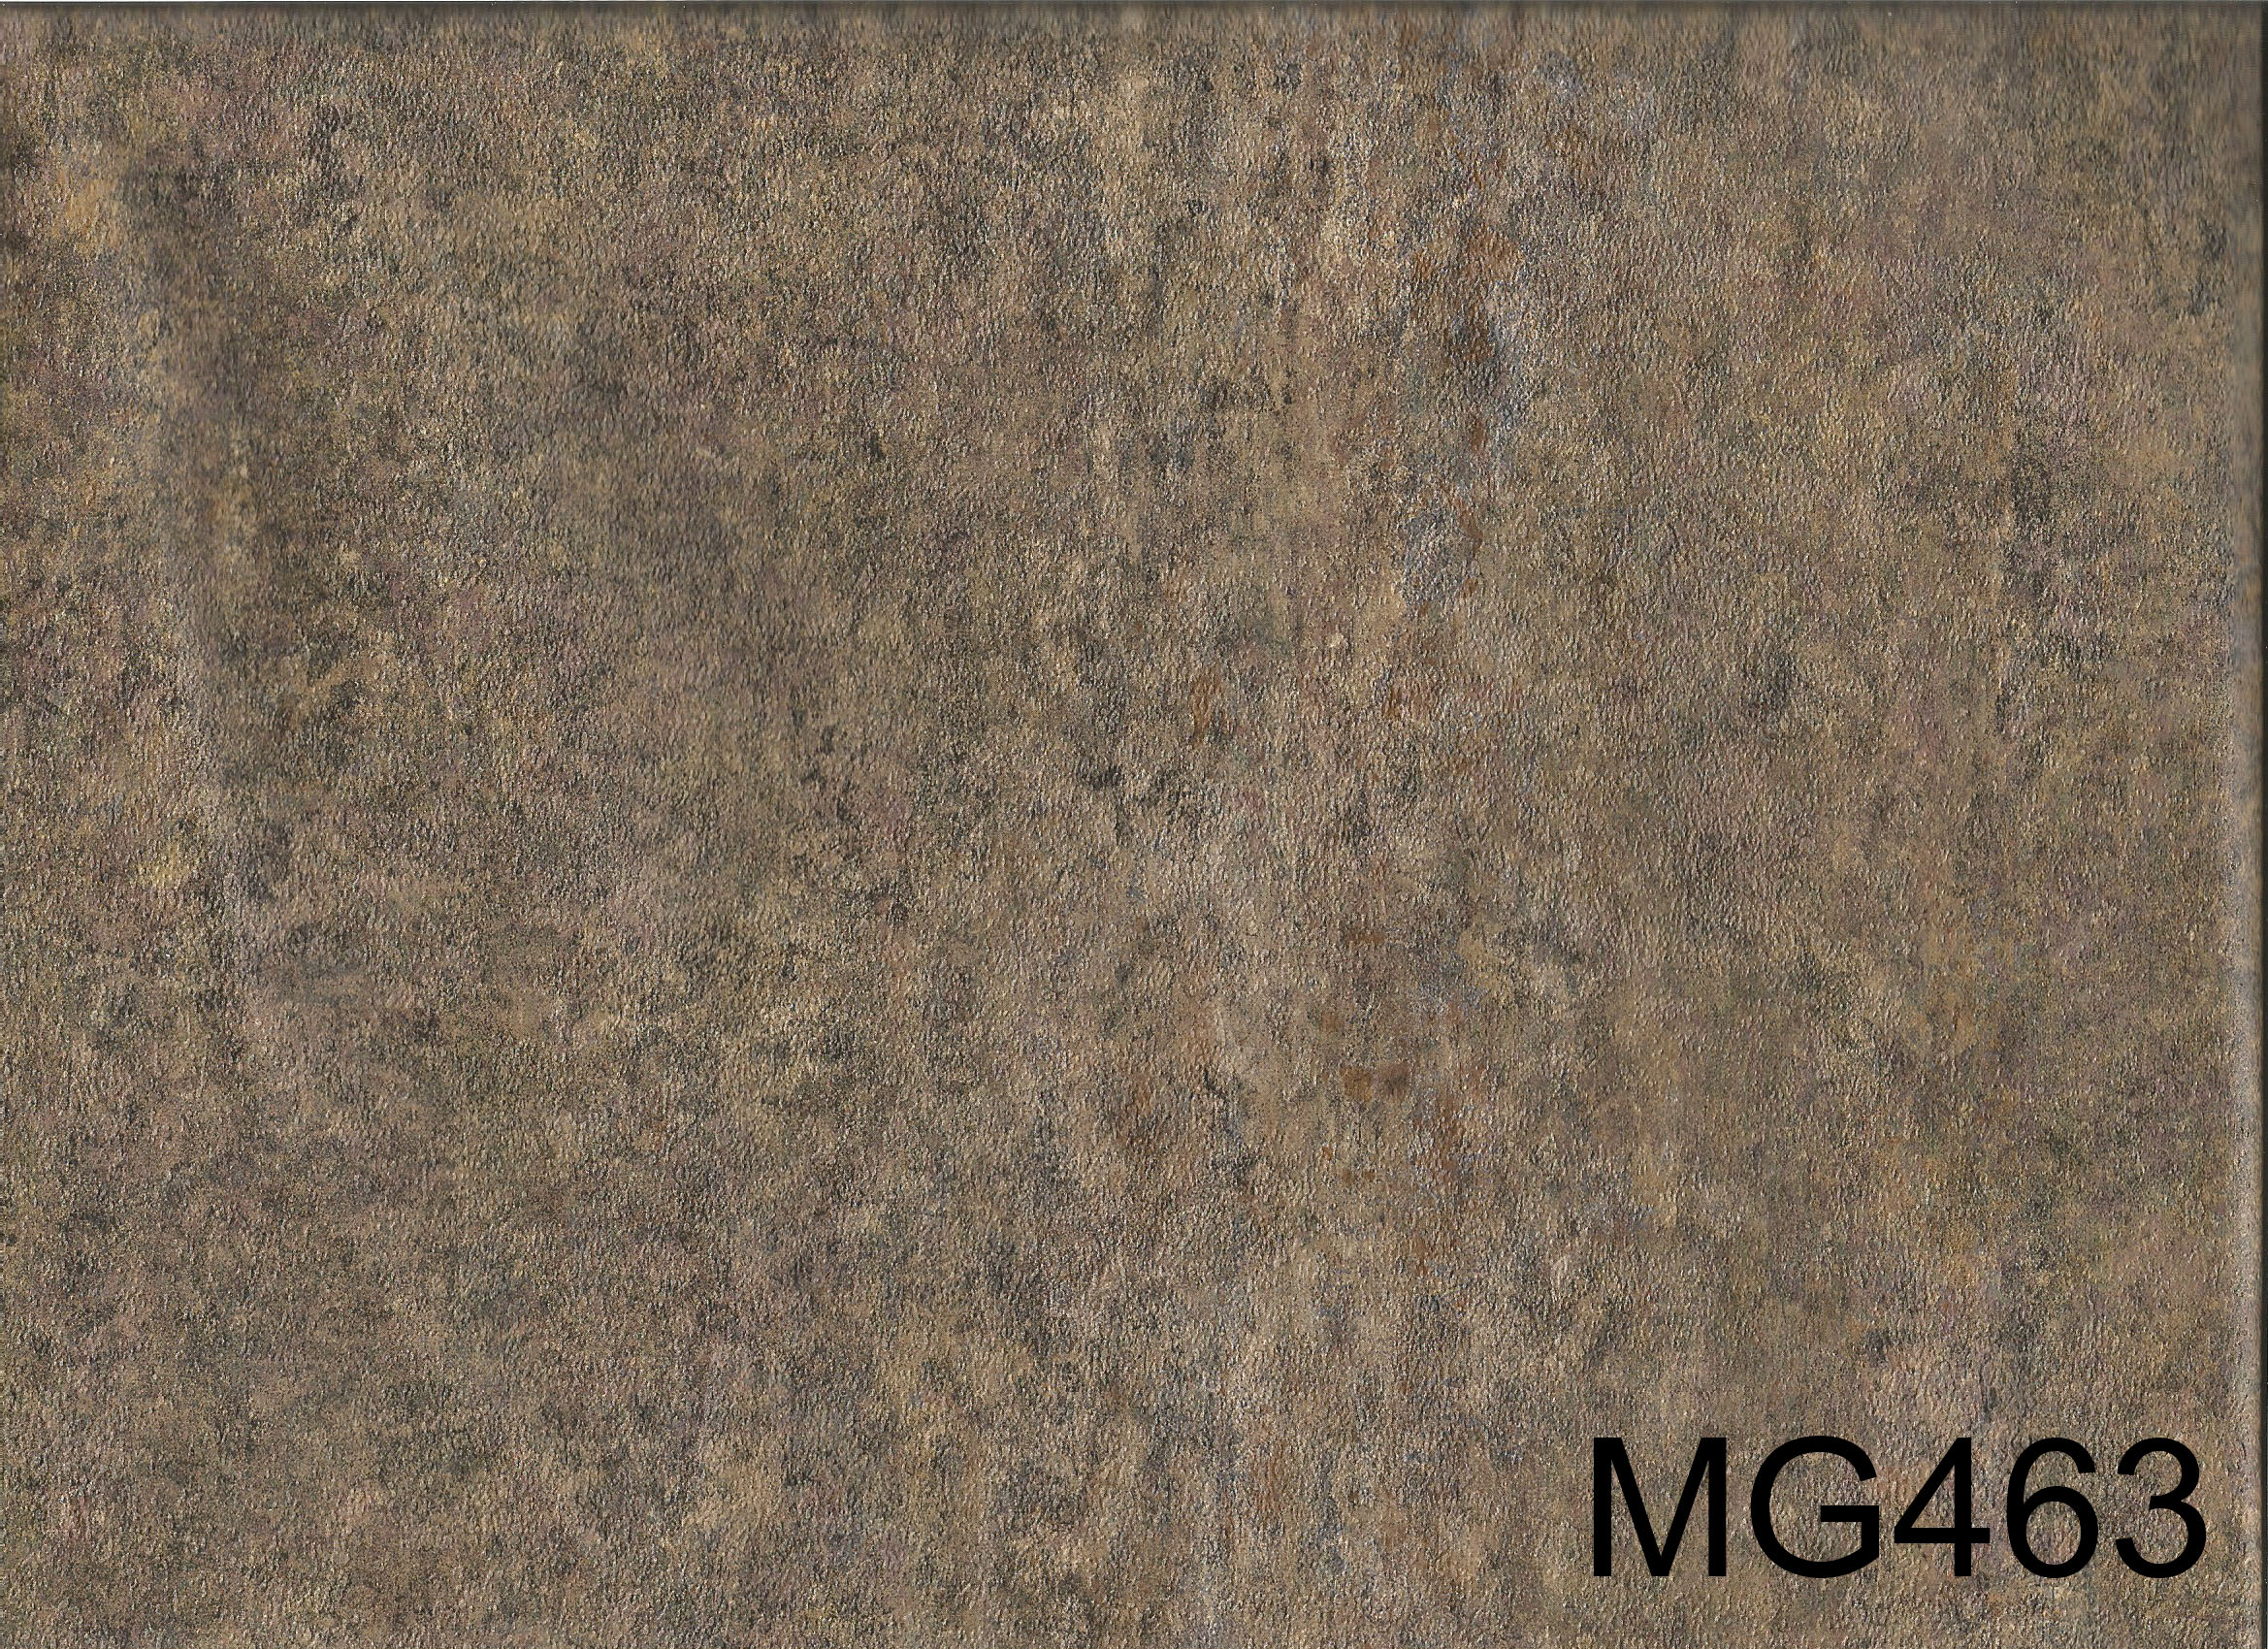 MG463